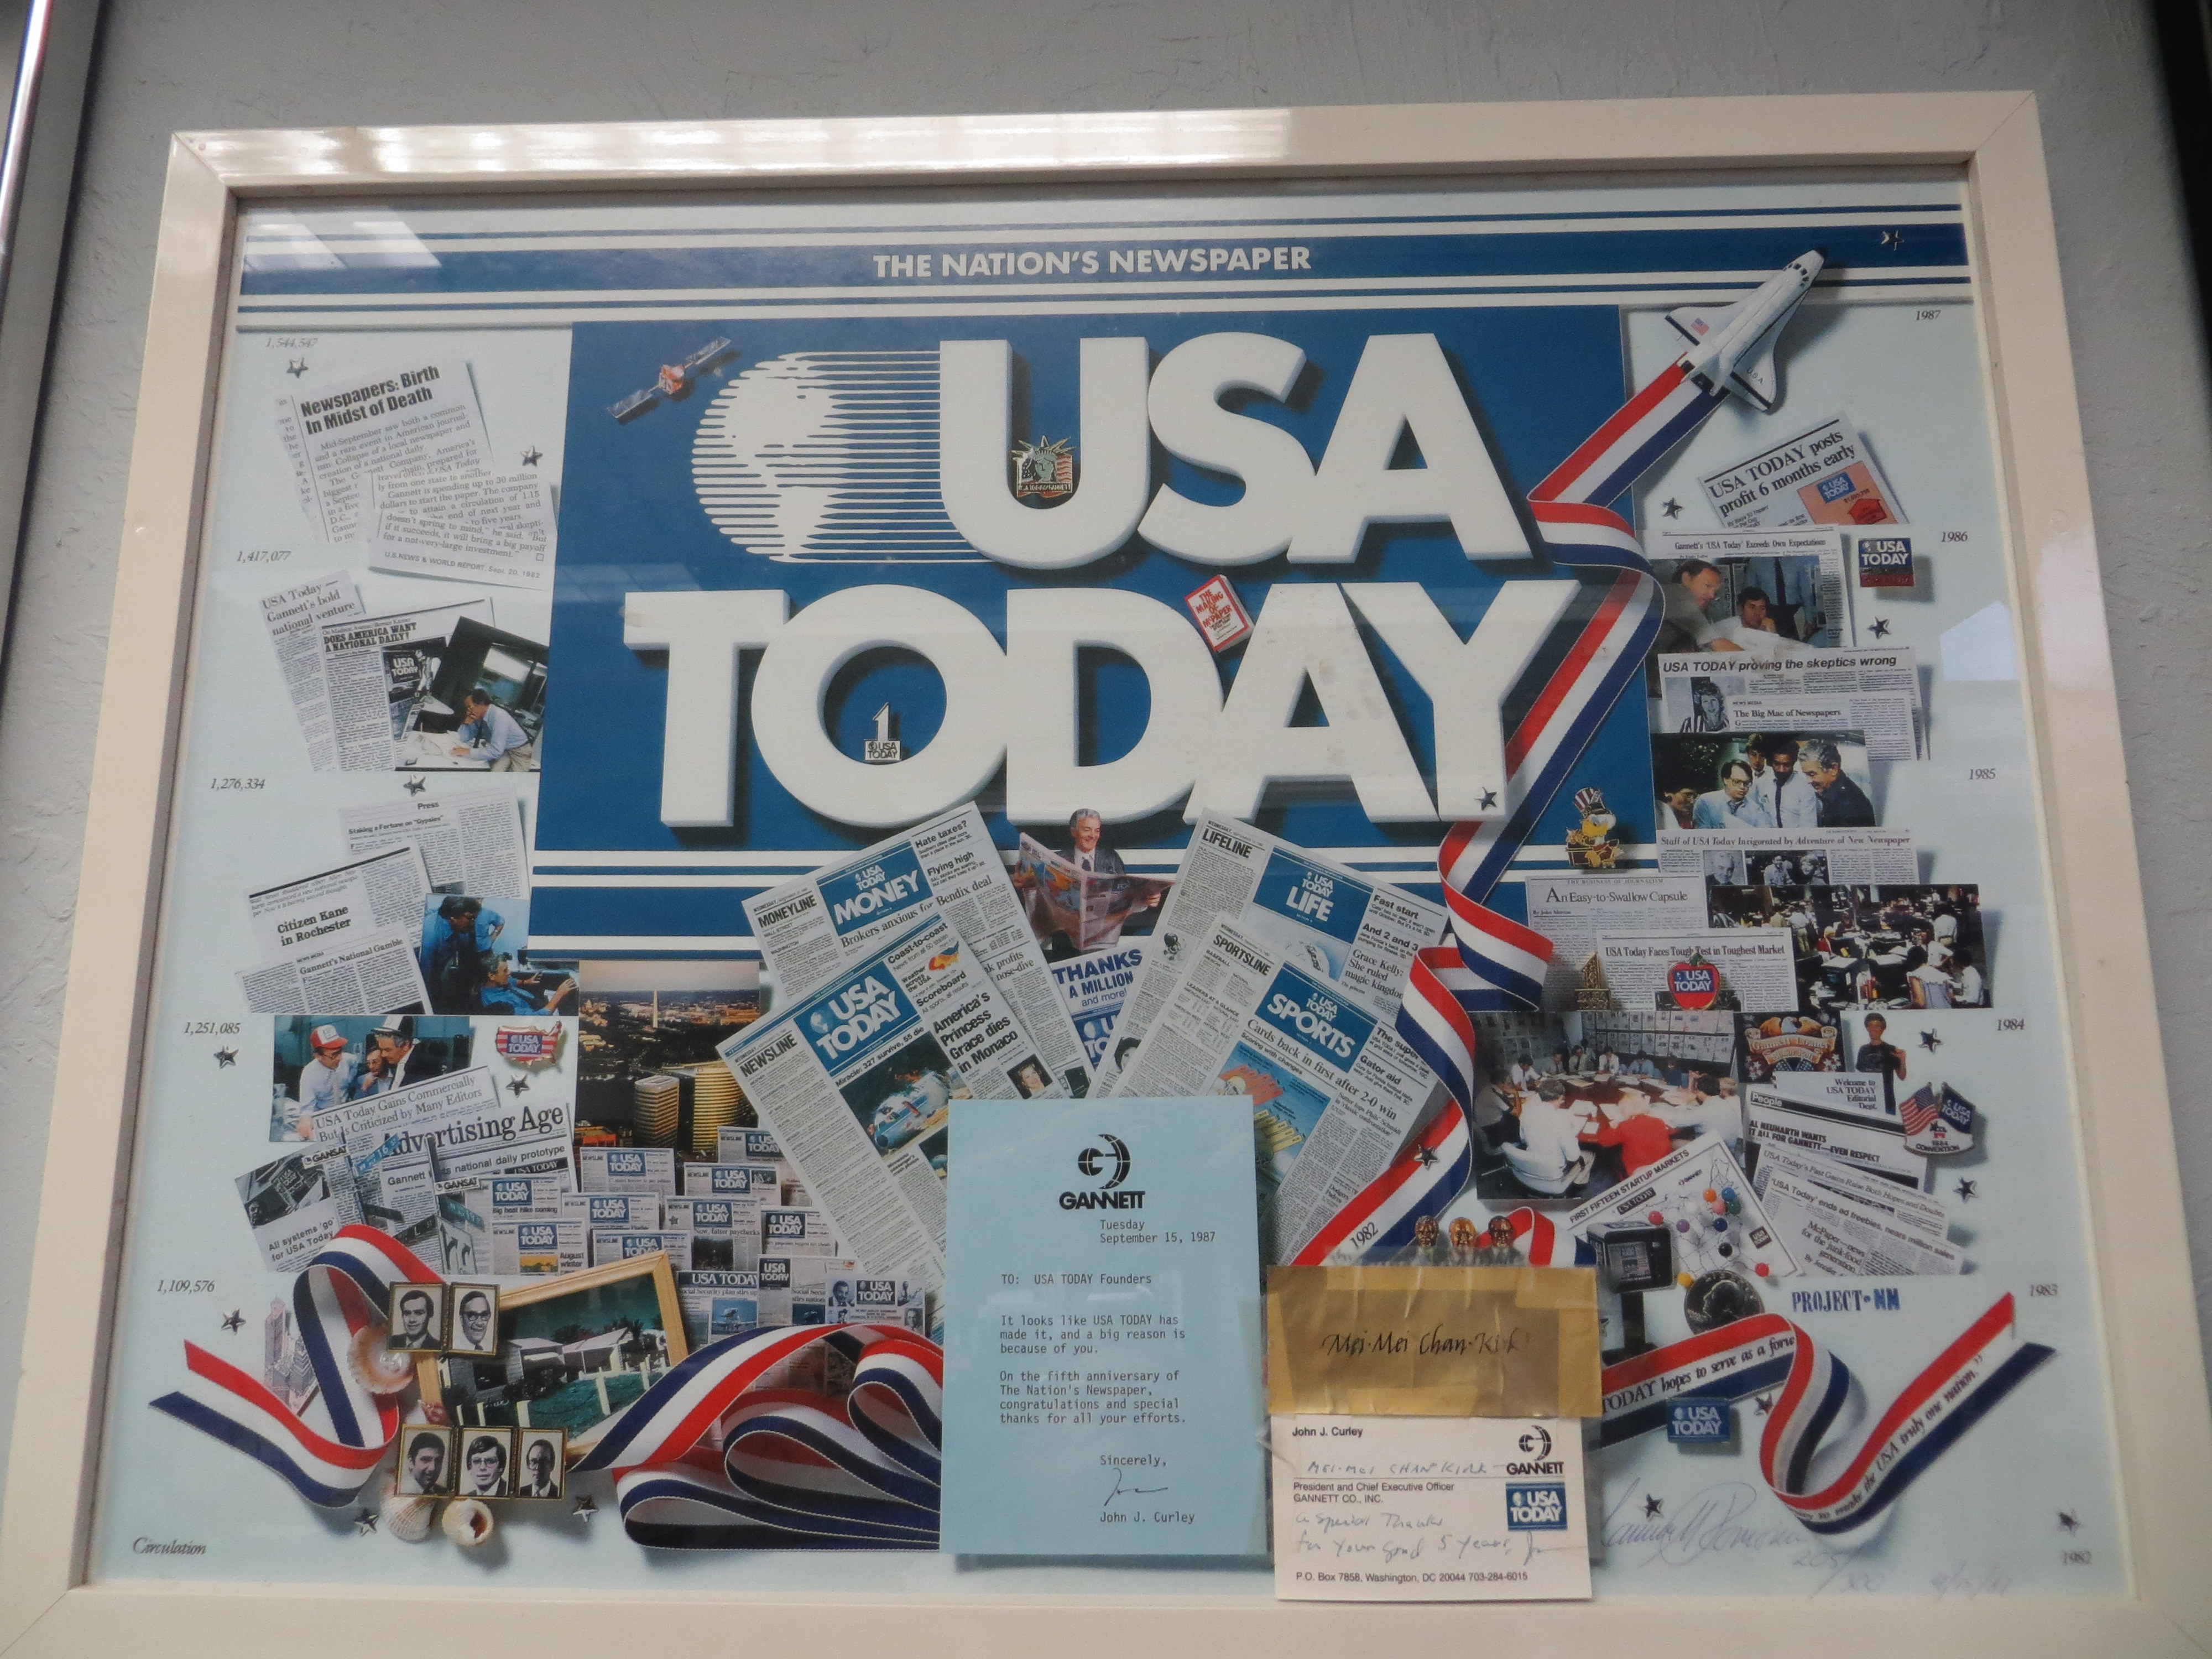 USA Today 5th anniversary